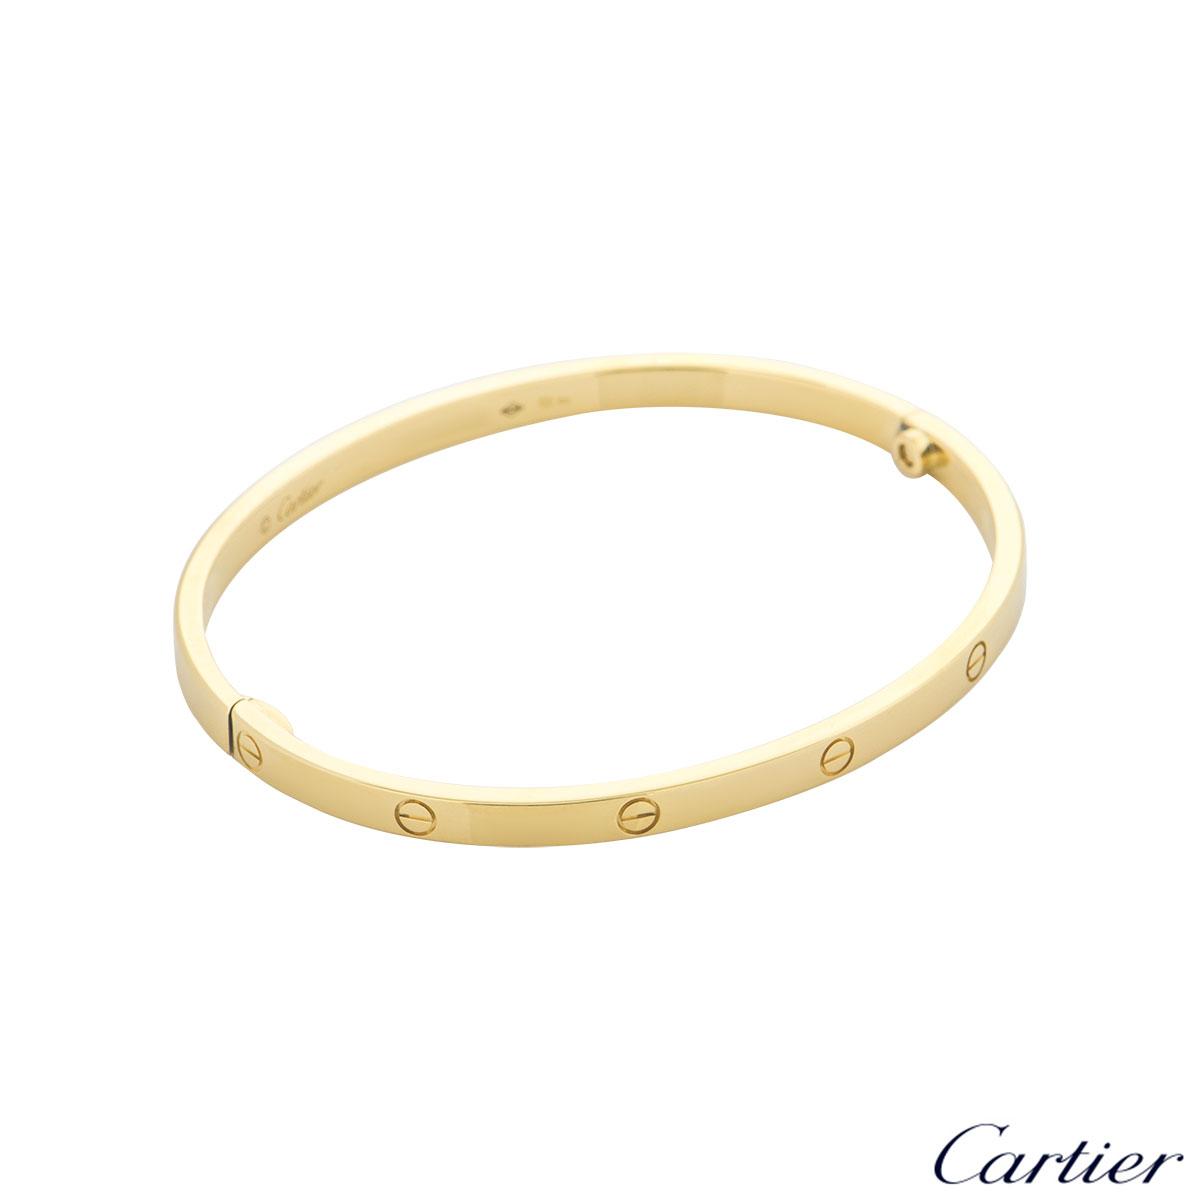 Cartier Yellow Gold Plain Love Bracelet SM Size 16 B6047516